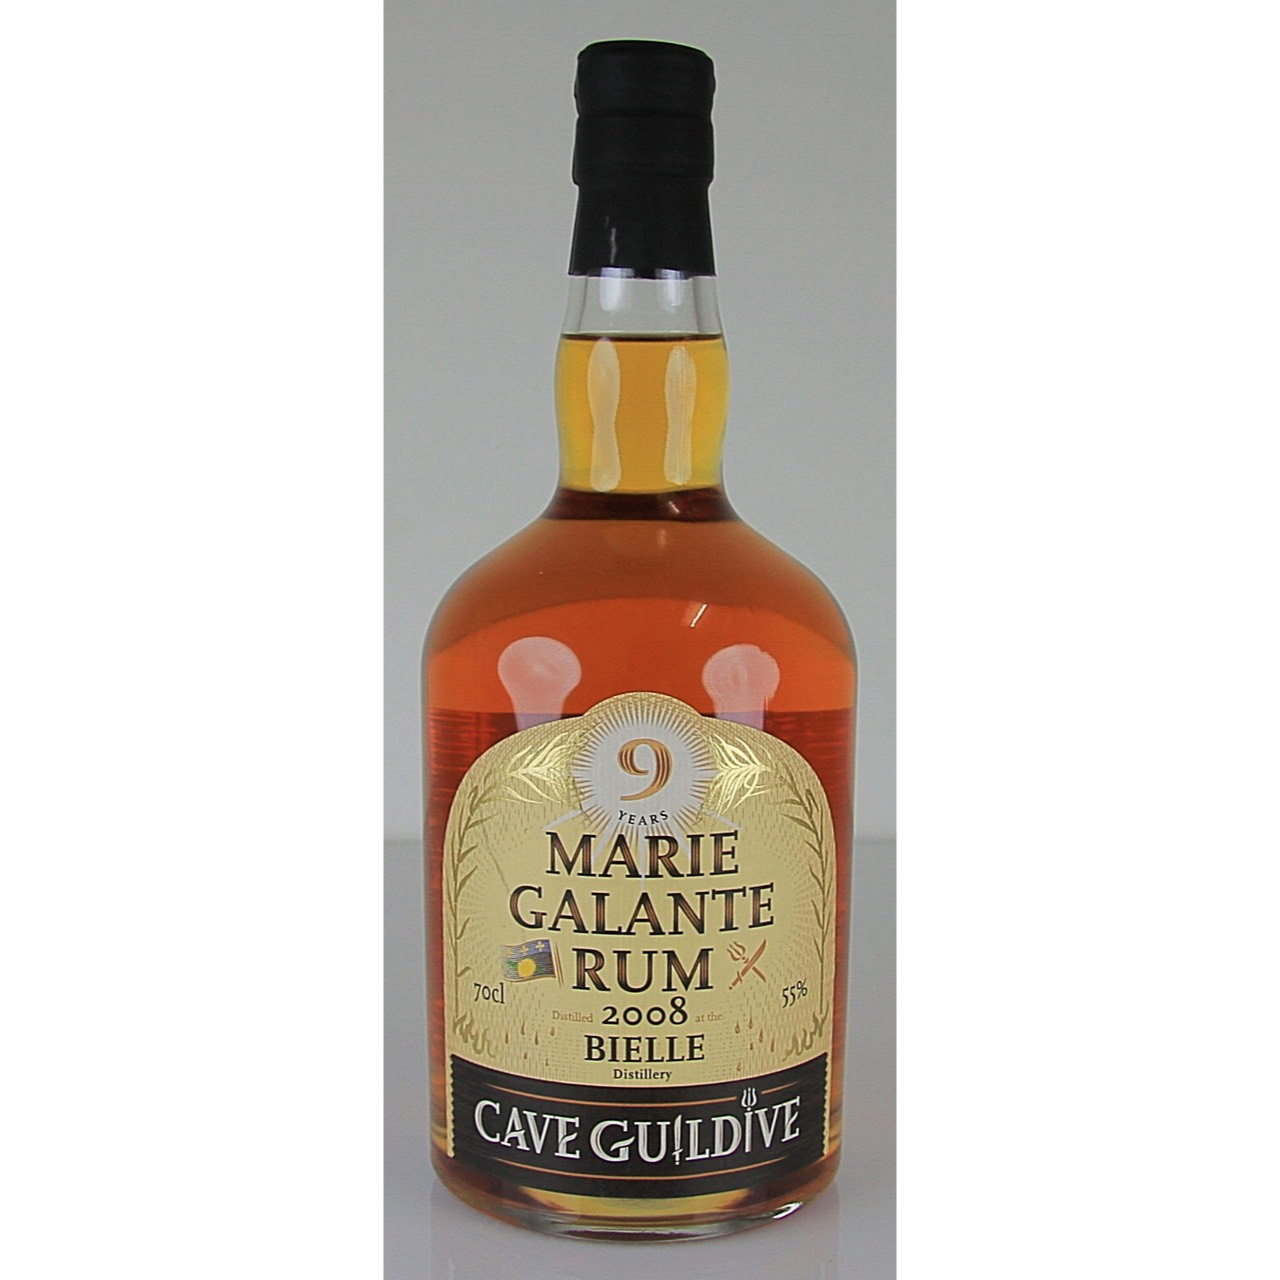 Bottle image of Marie Galante Rum